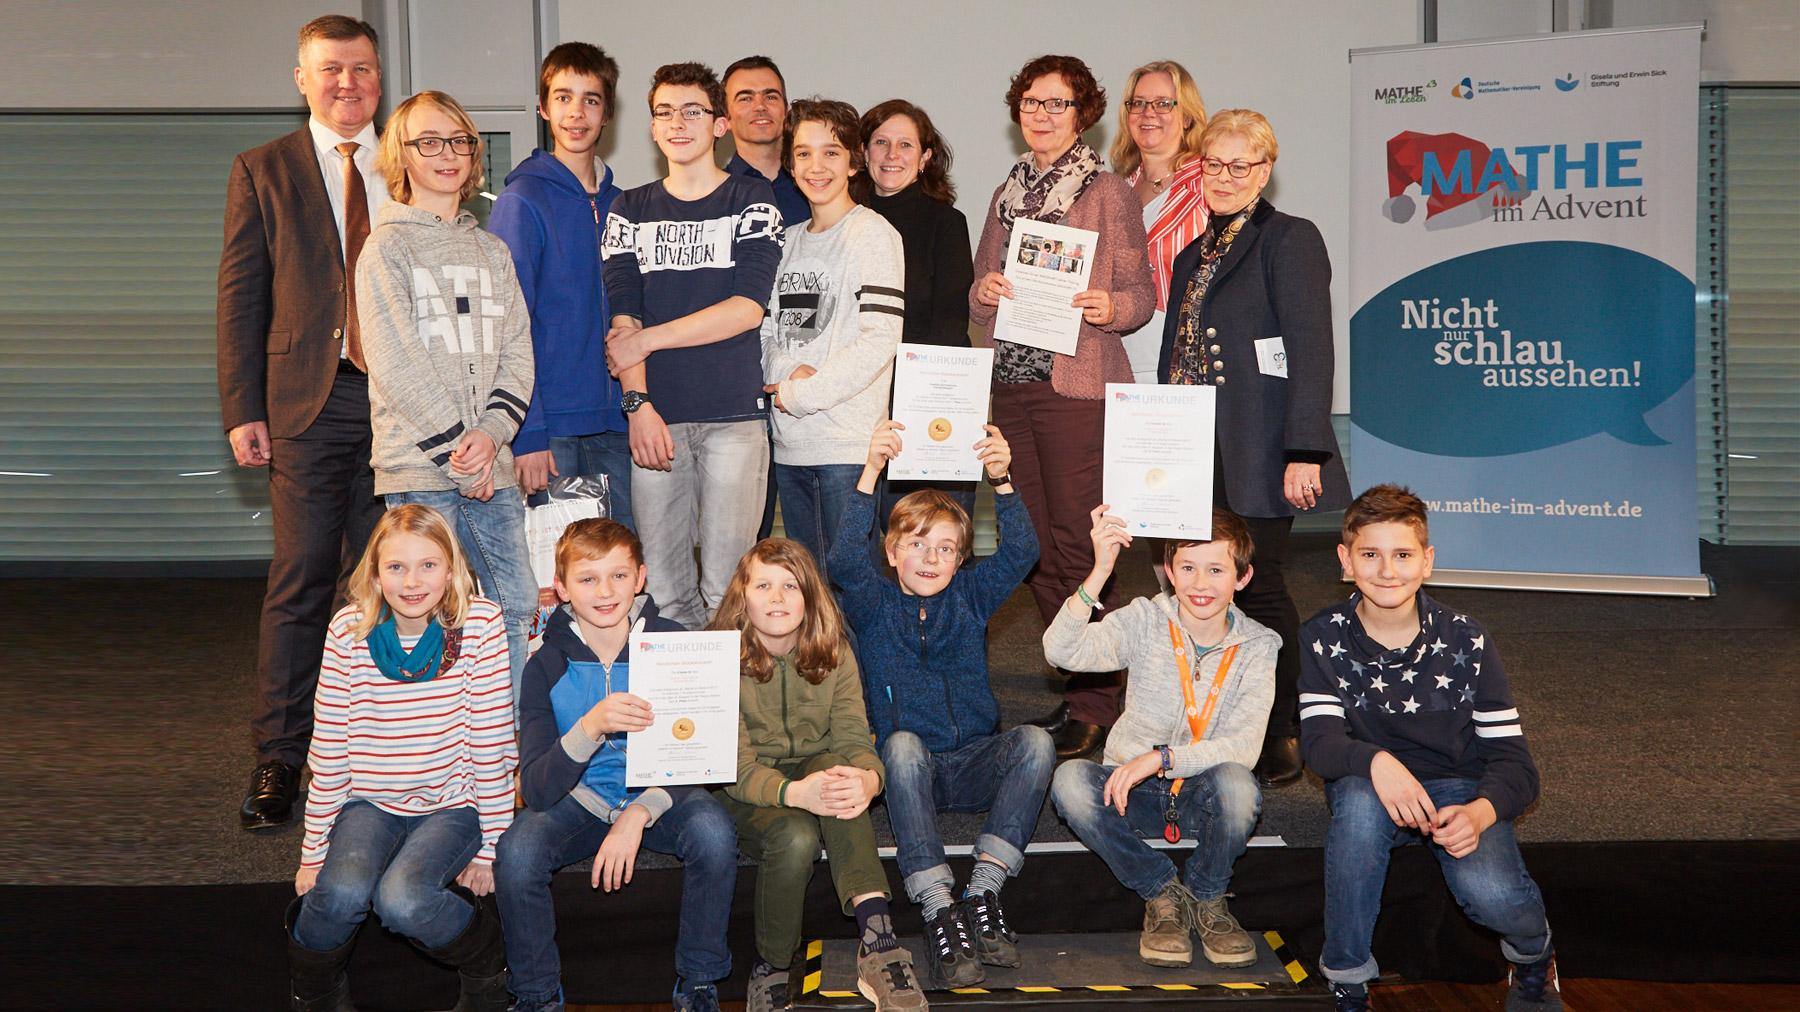 Mathe-im-Advent-Gewinner-Emmendingen-Goethe-Gymnasium-EM-feat